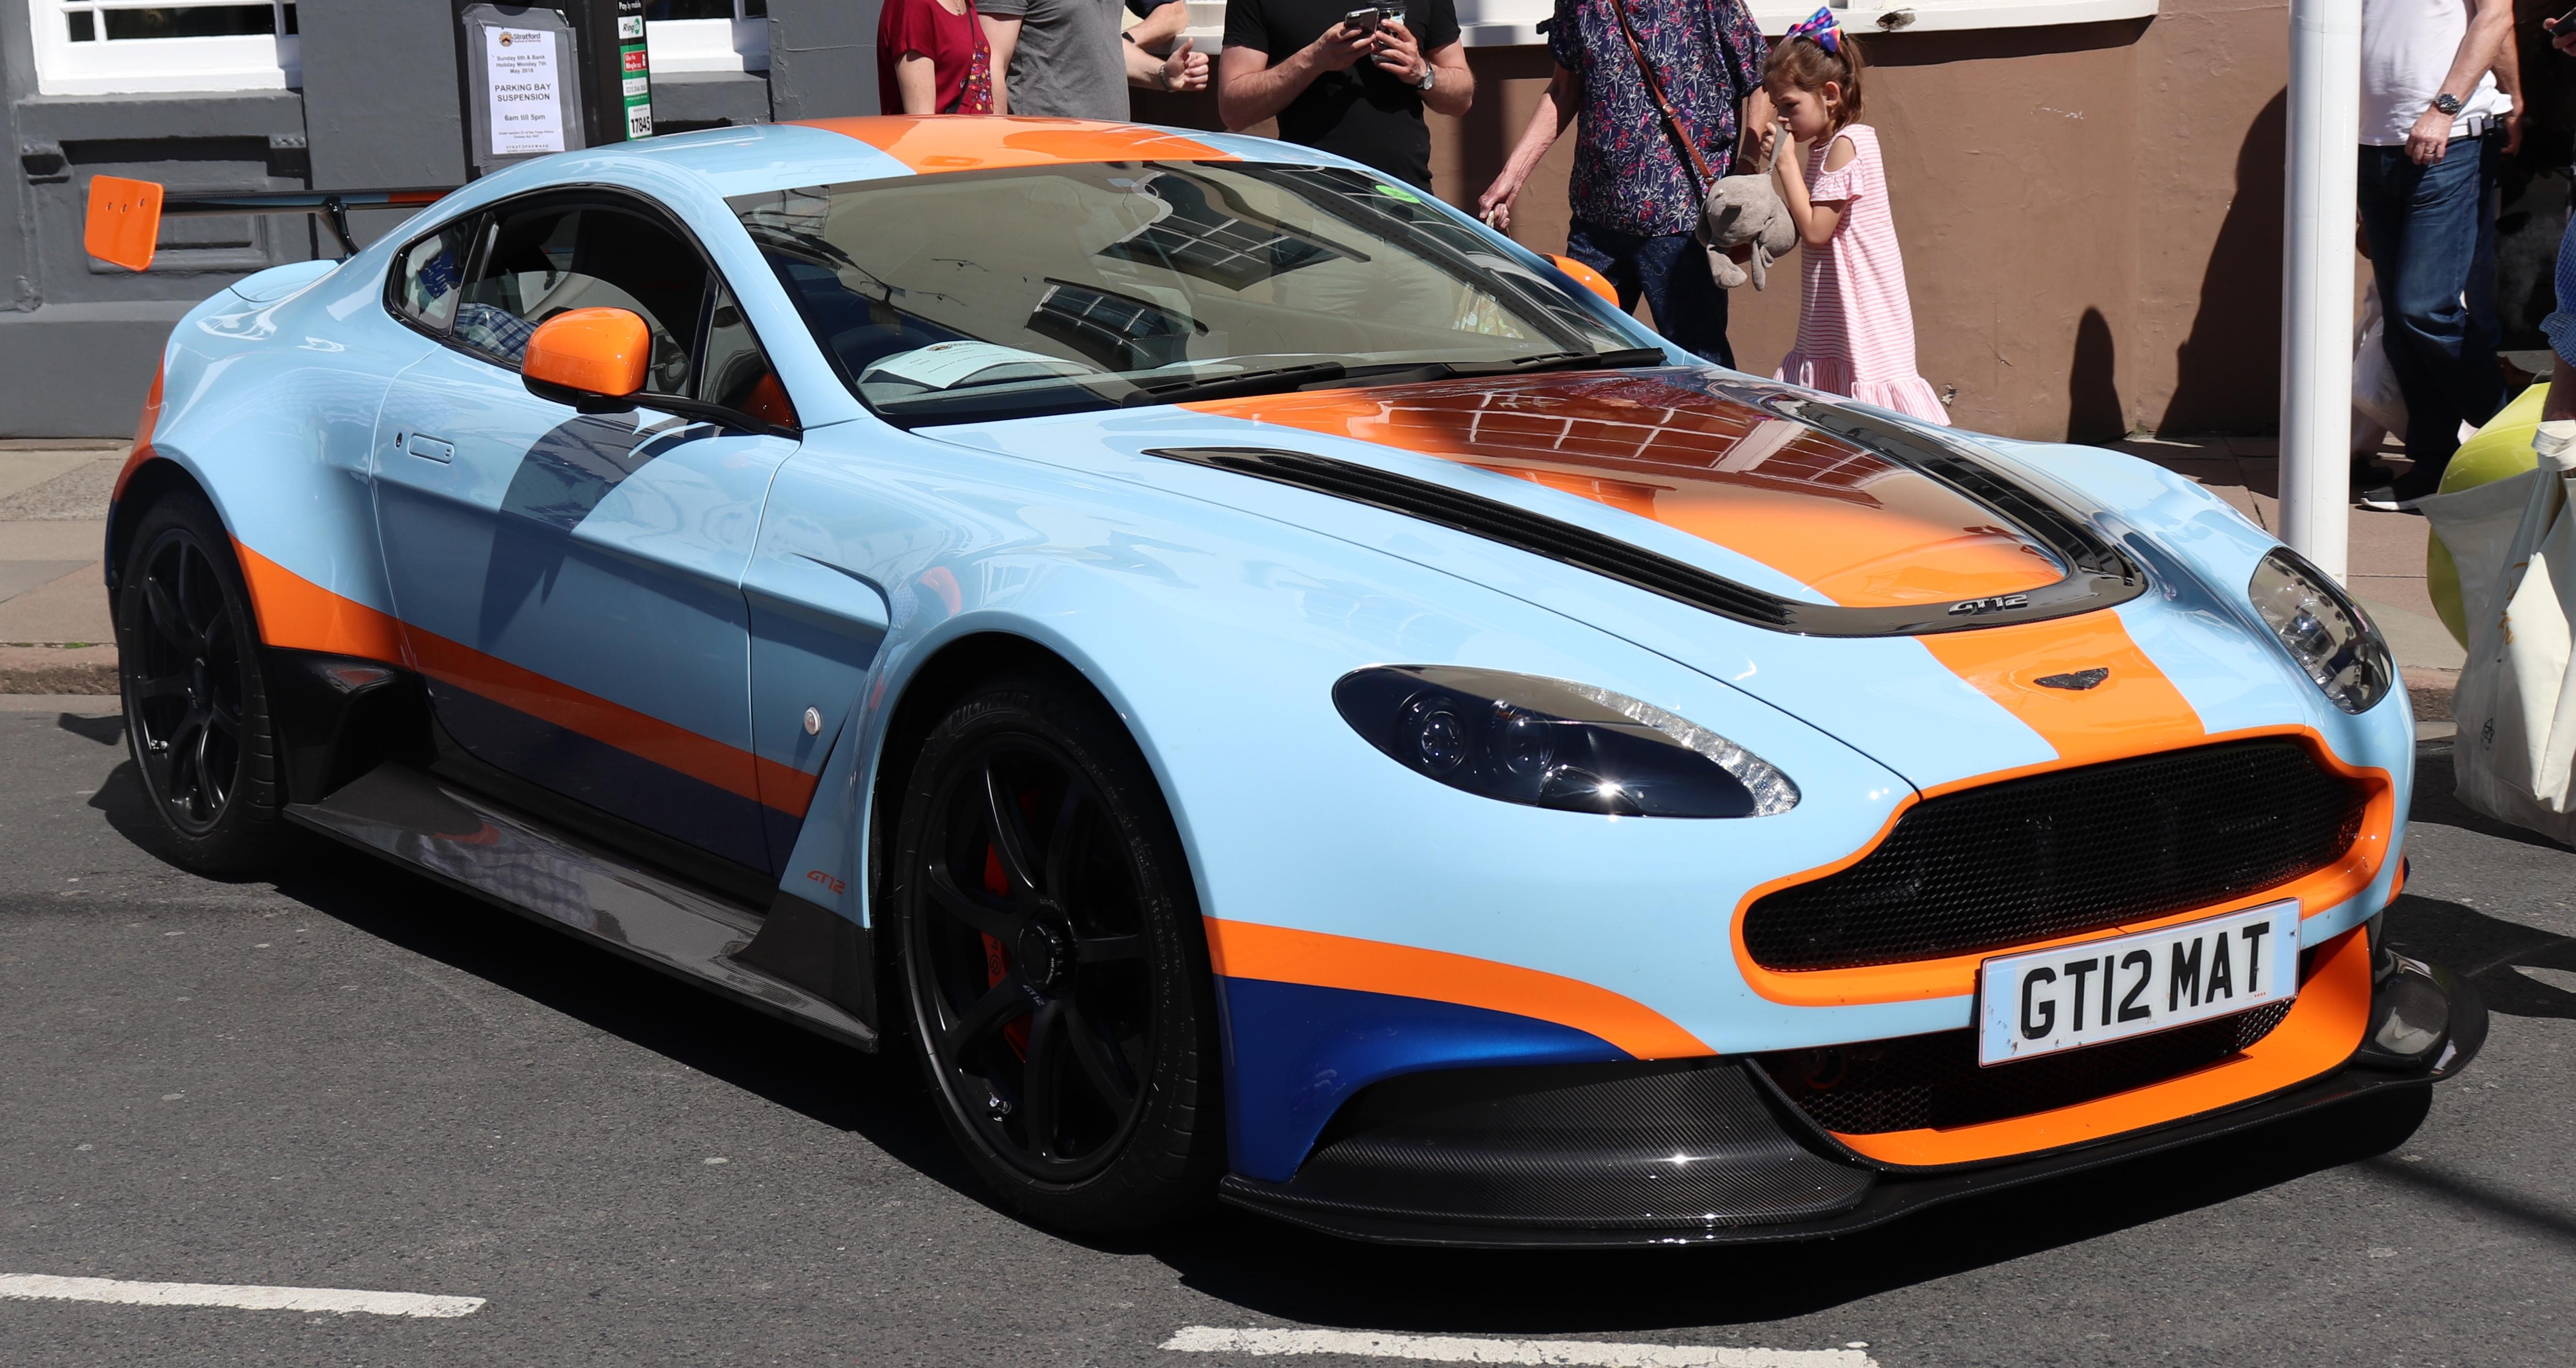 File Aston Martin Vantage GT Automatic Jpg Wikimedia - Aston martin vantage gt 2018